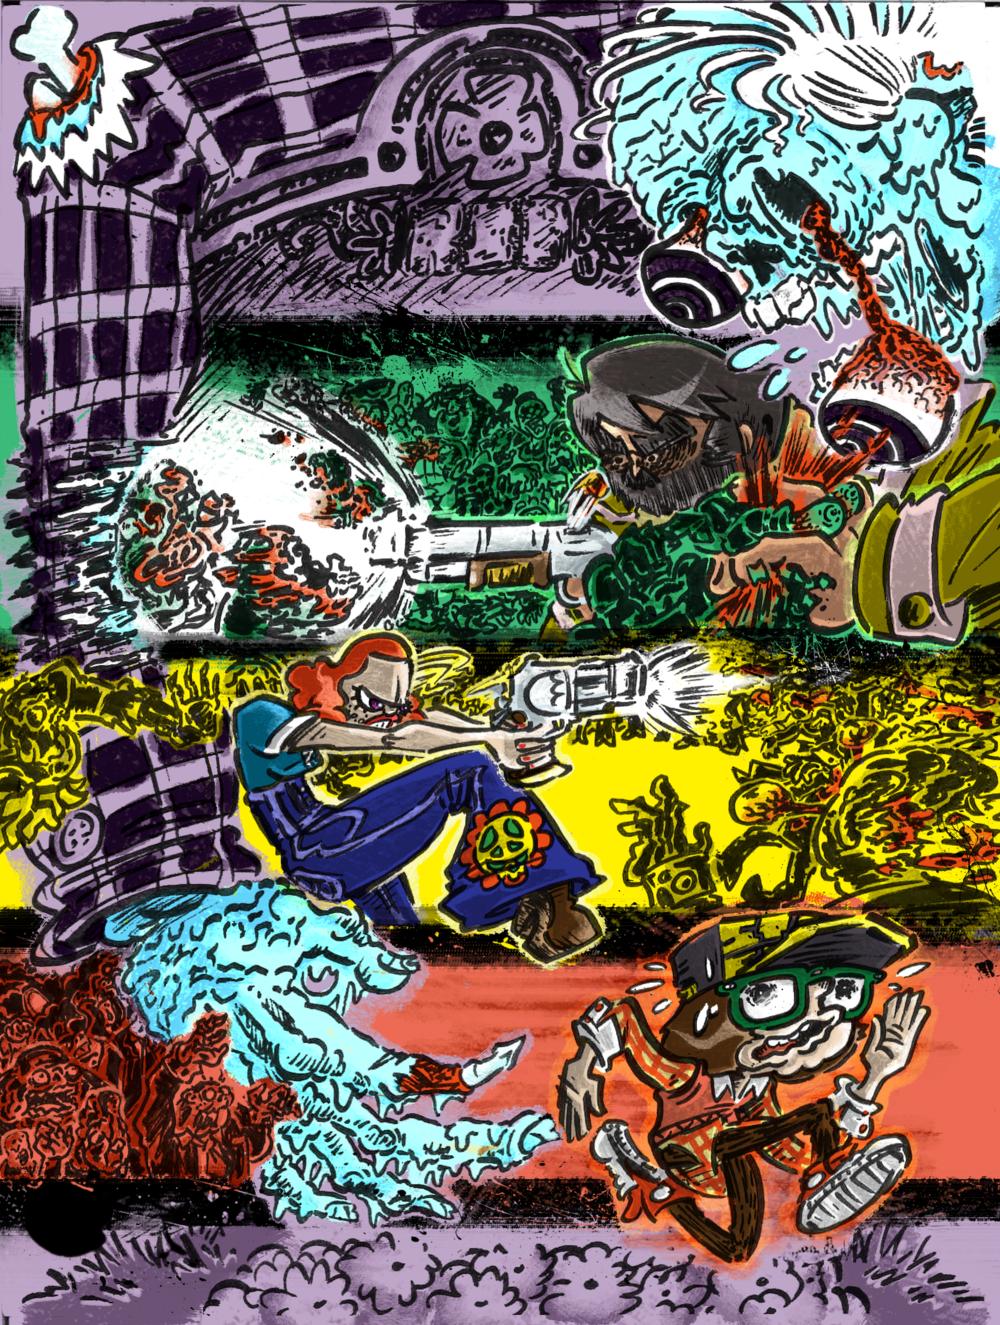 COMIC COVER #1